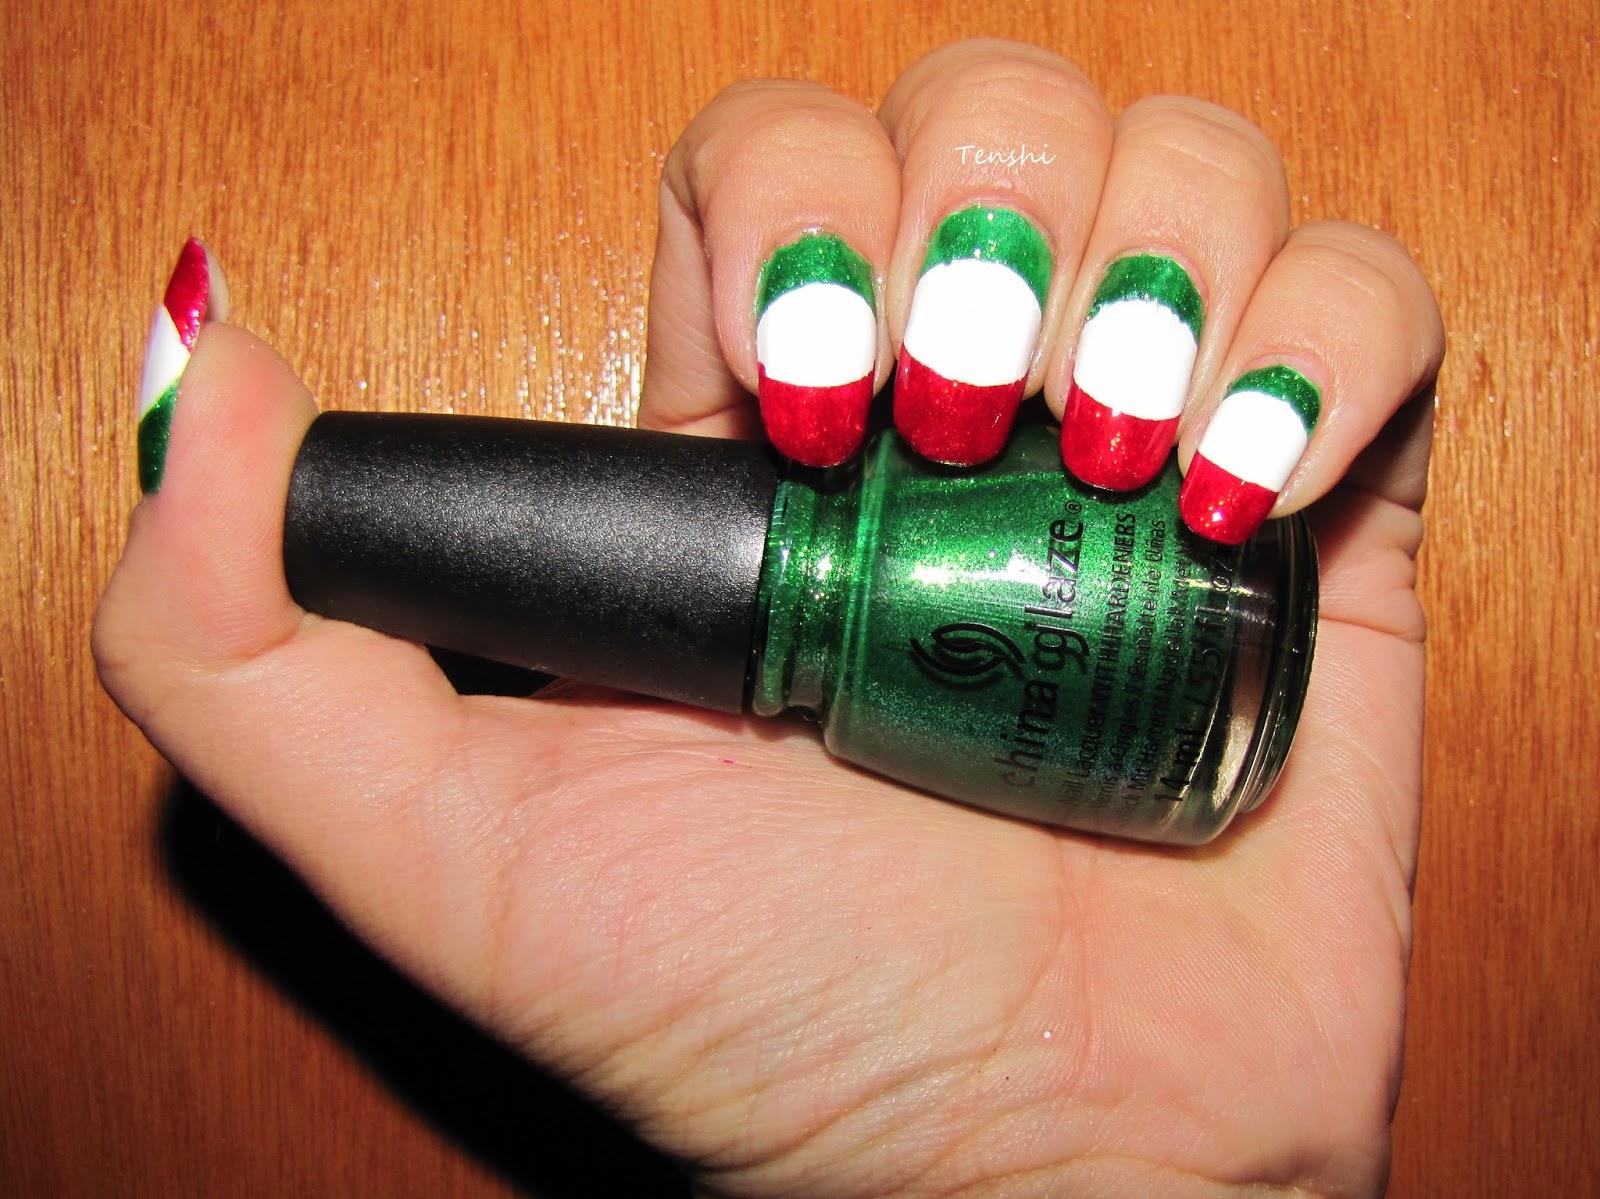 Nails by Tenshi: Uñas mexicanas